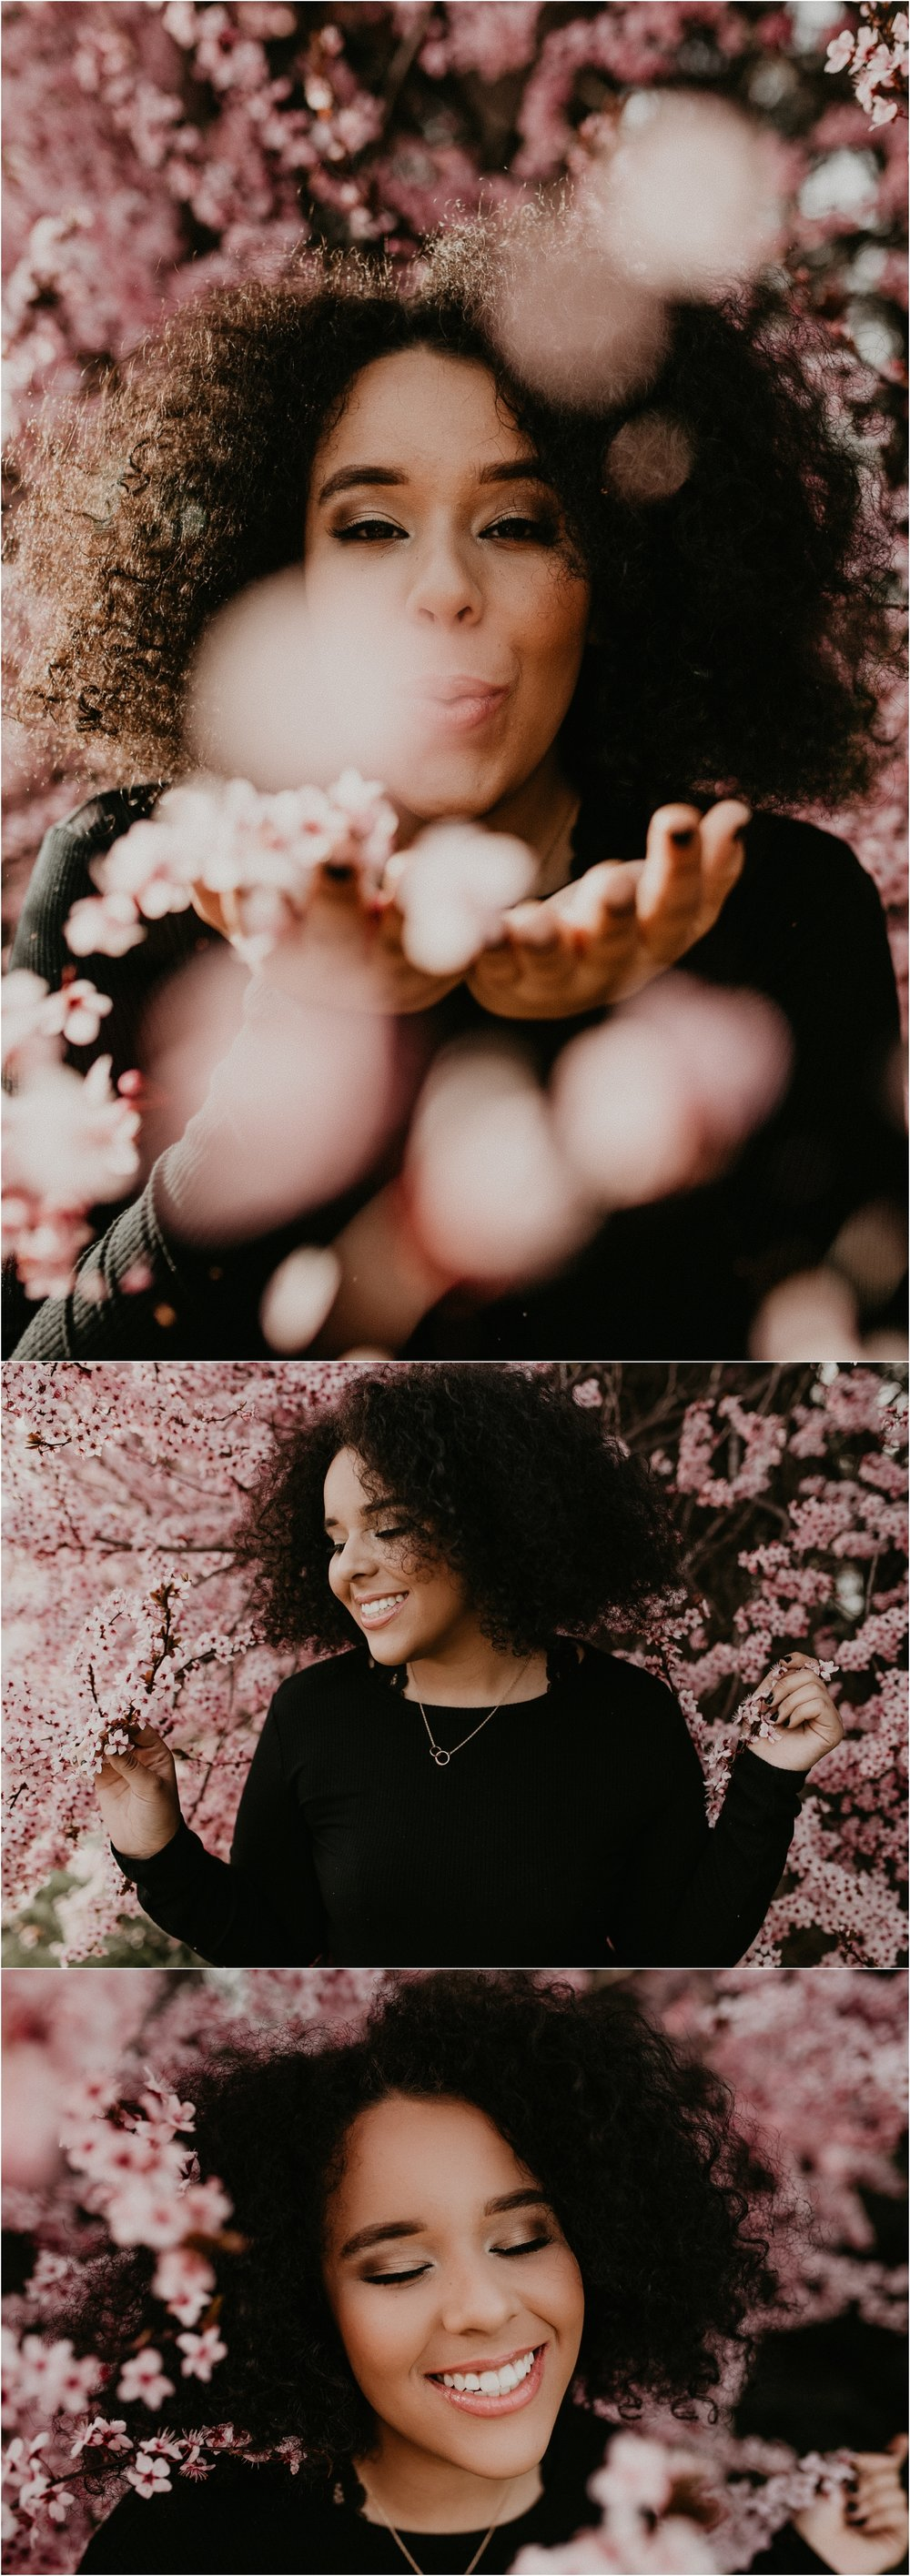 Boise Senior Photographer Spring Senior Pictures Class of 2018 Cherry Blossoms Idaho Location Spring Senior Outfit Meridian Photographer